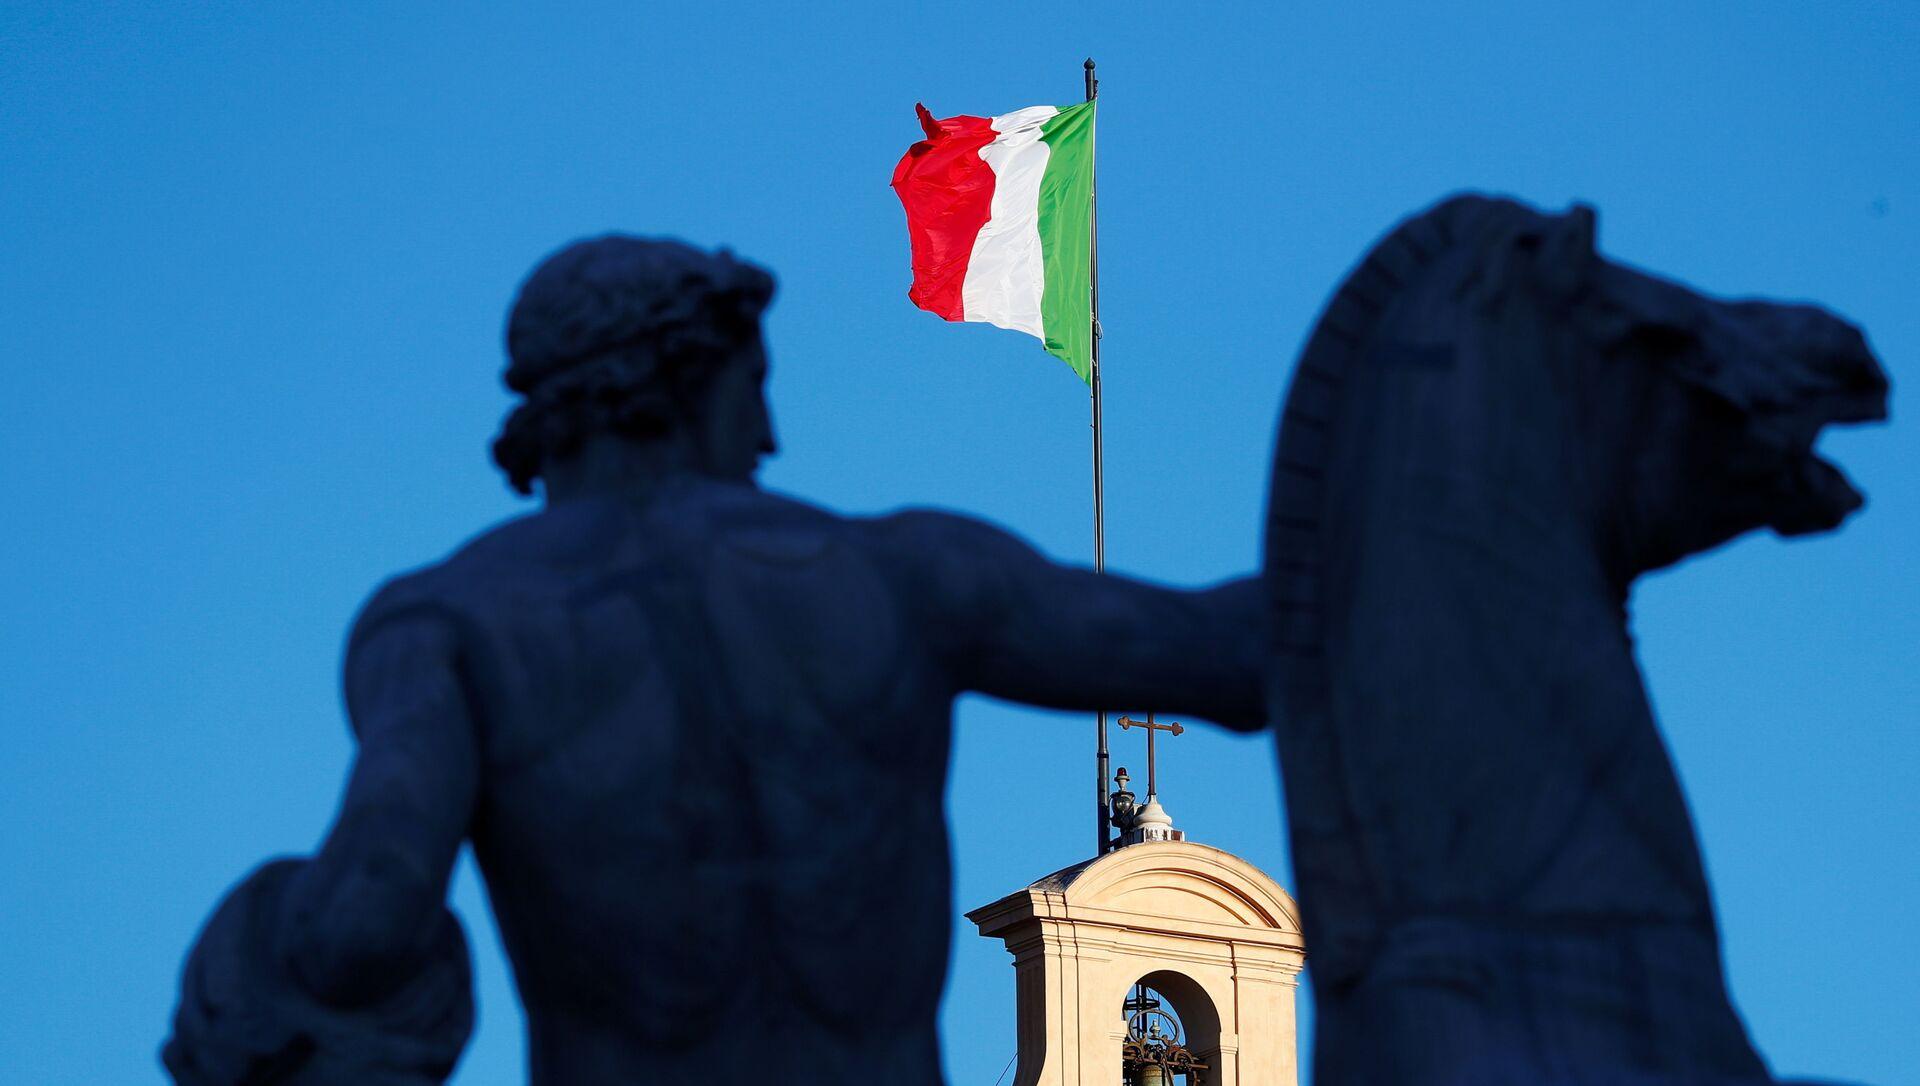 Bandera de Italia - Sputnik Mundo, 1920, 01.02.2021